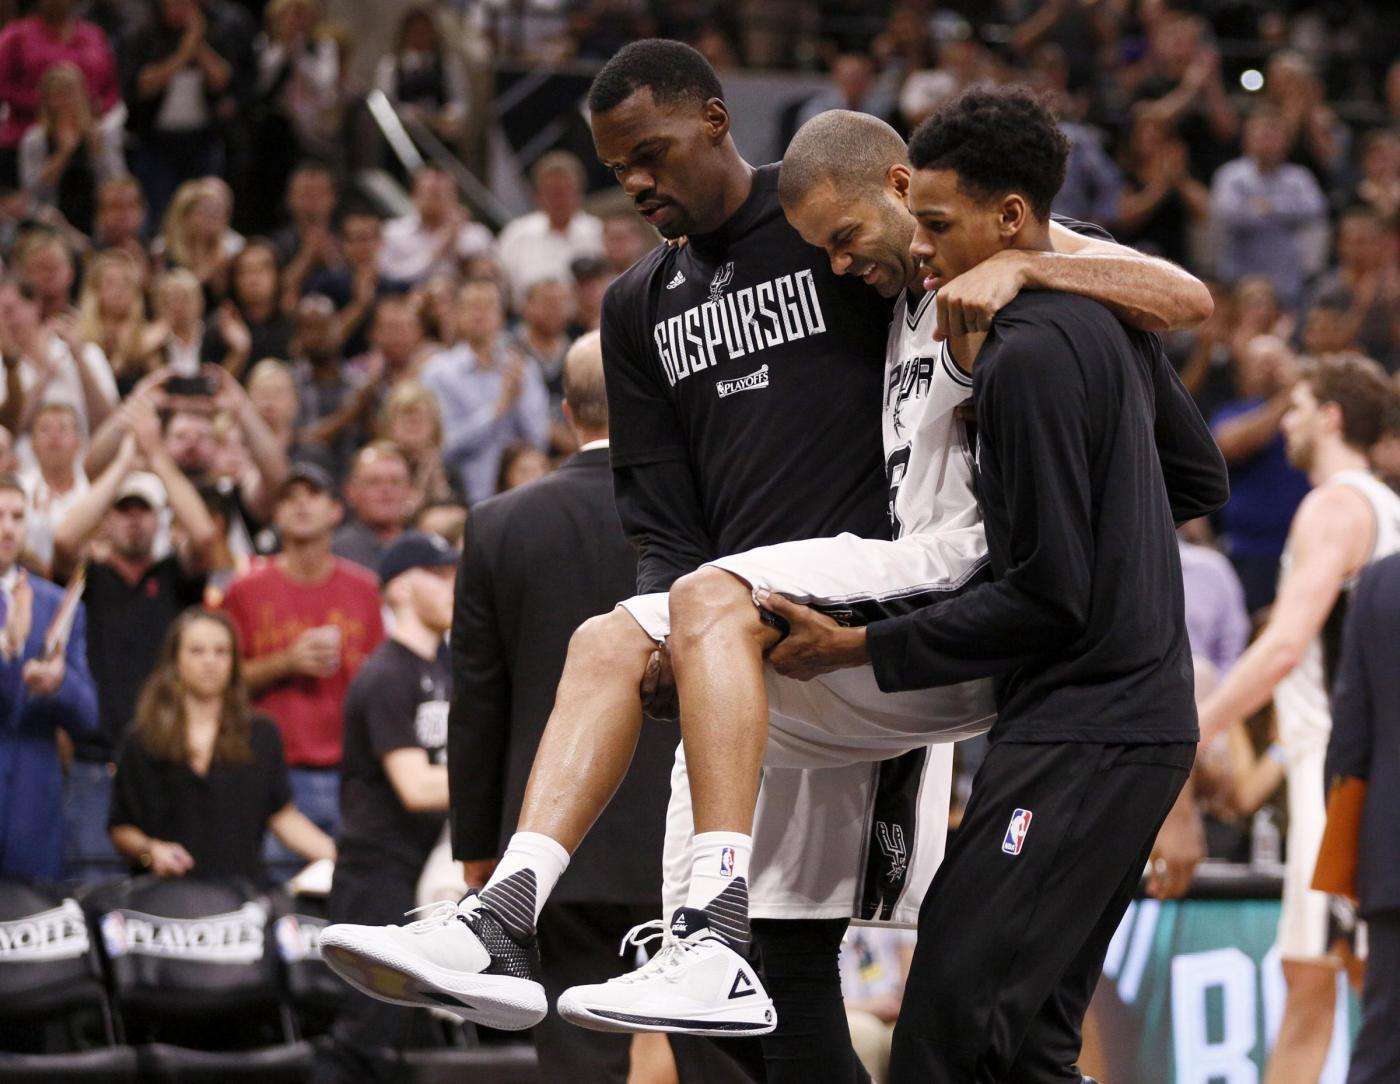 Nba Playoffs Houston Rockets Vs San Antonio Spurs